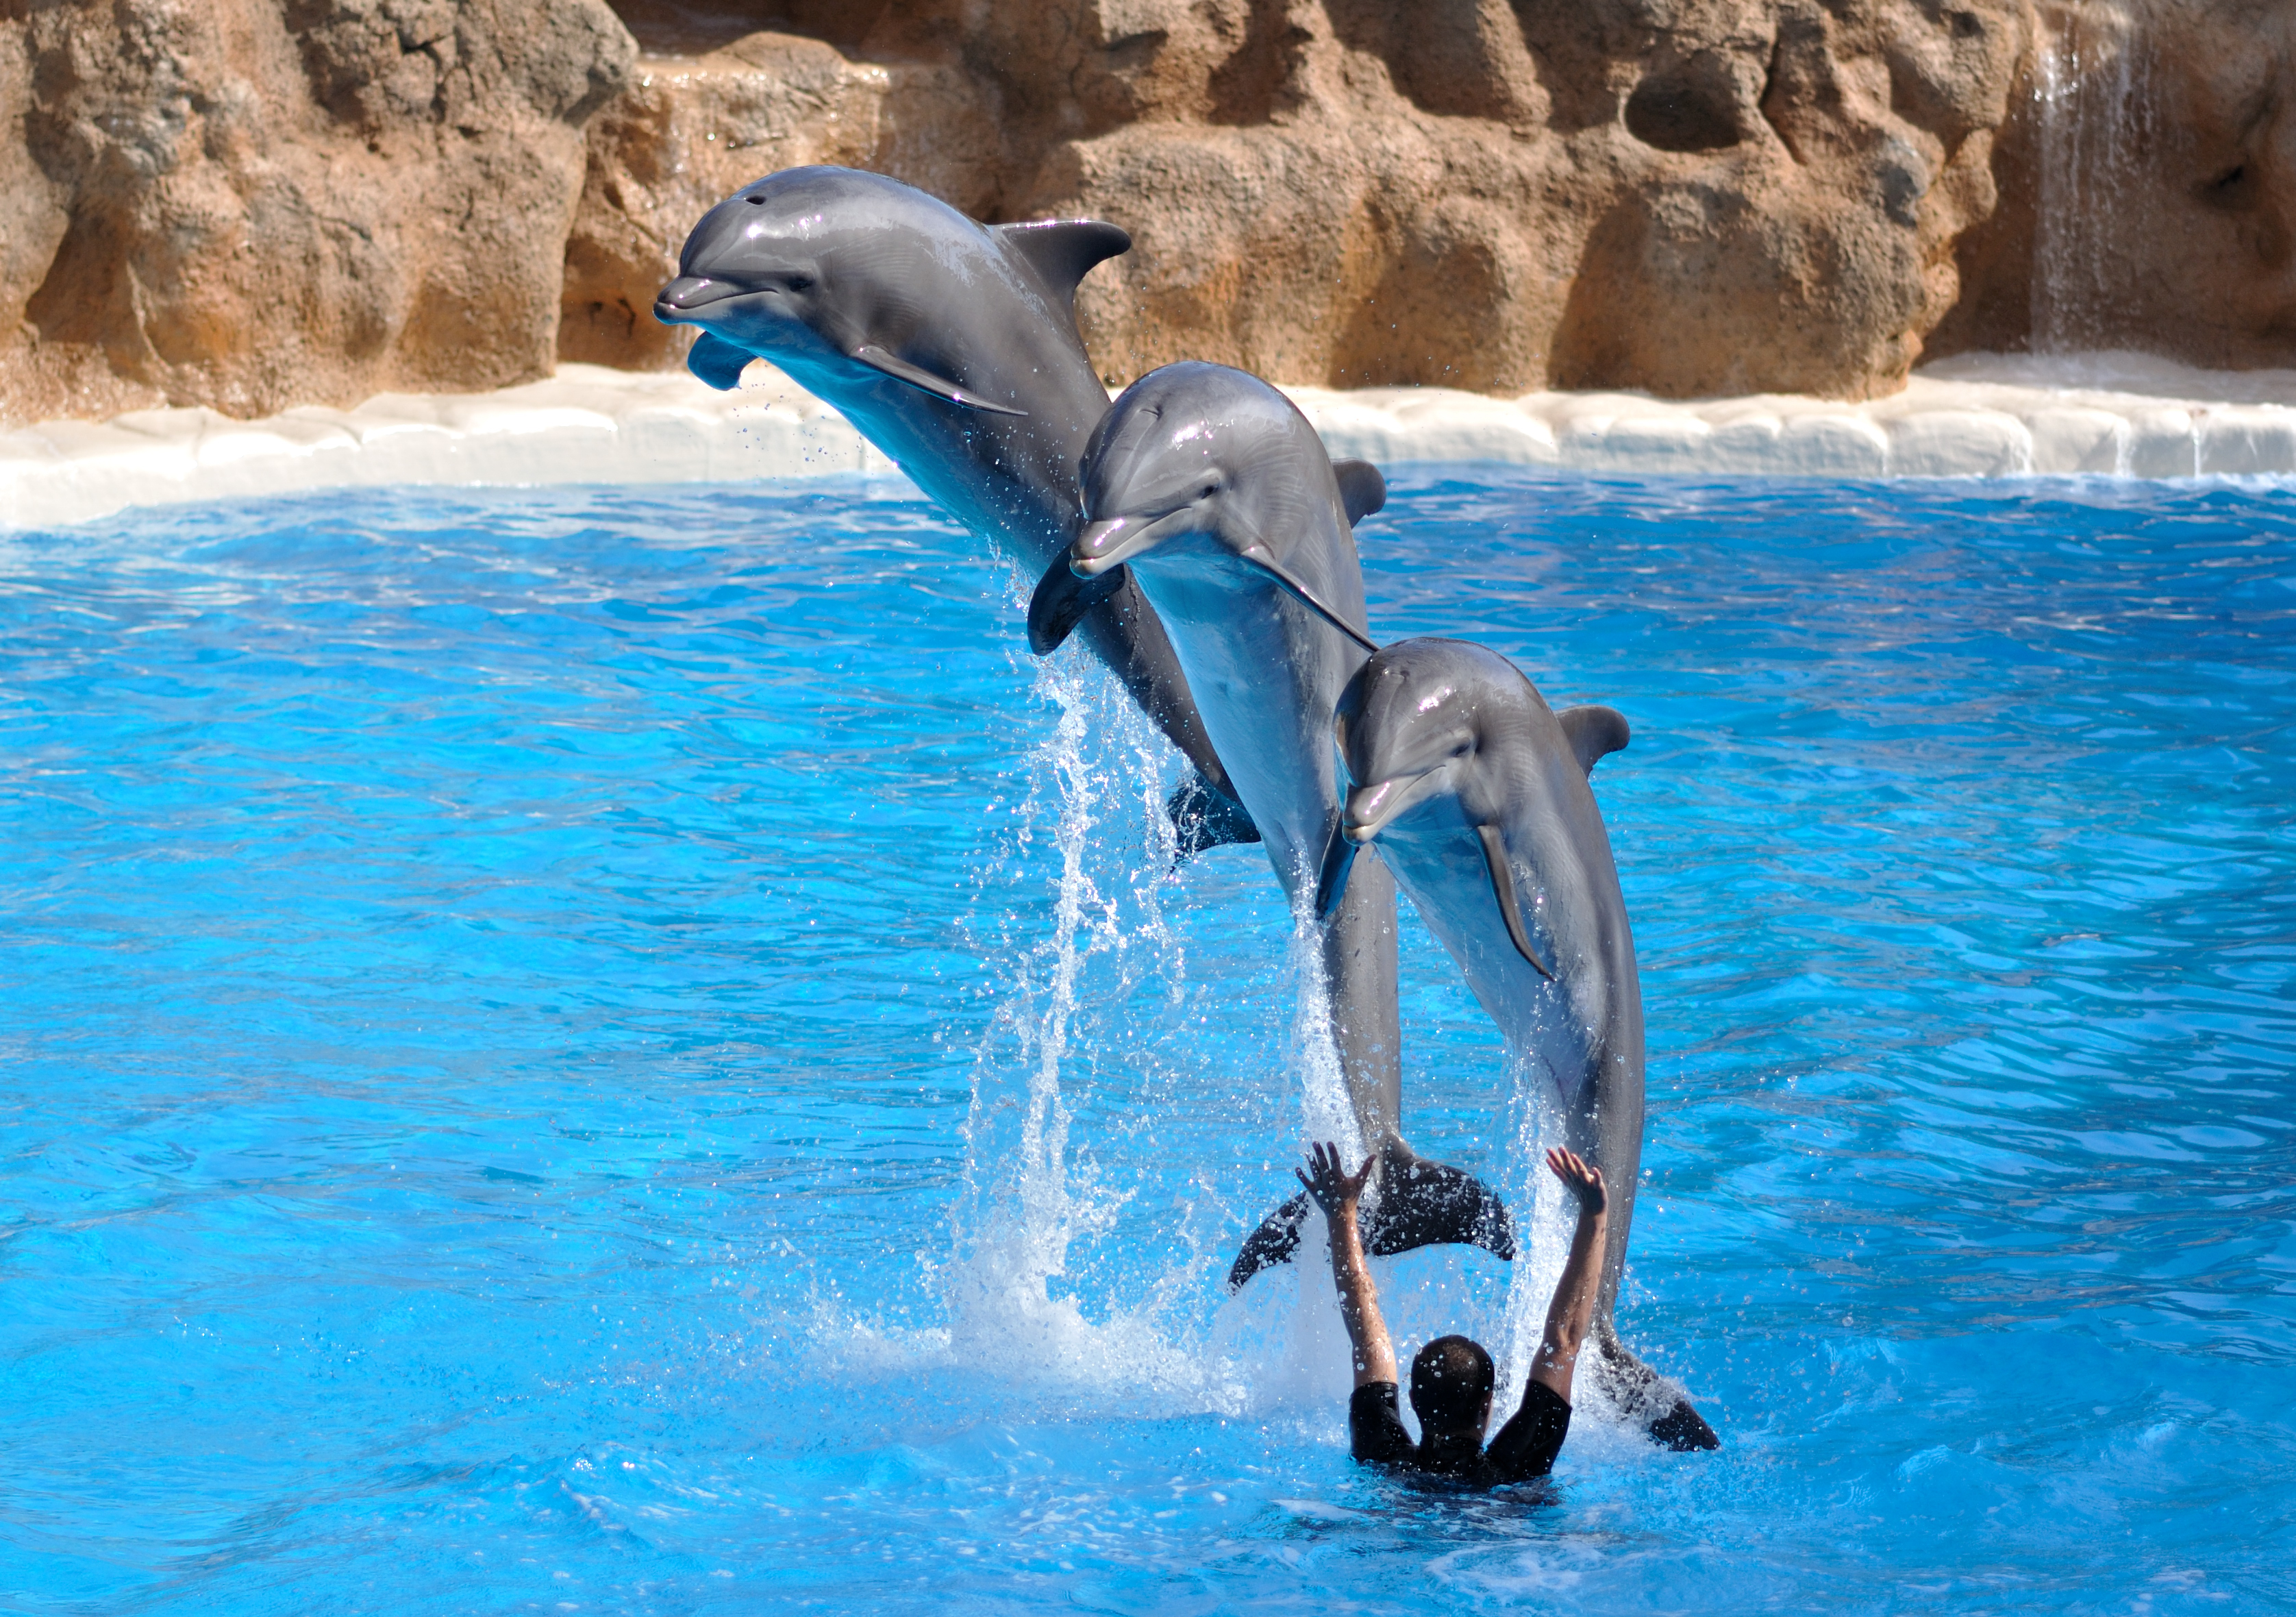 File:Dolphins jumping qtl1.jpg - Wikimedia Commons